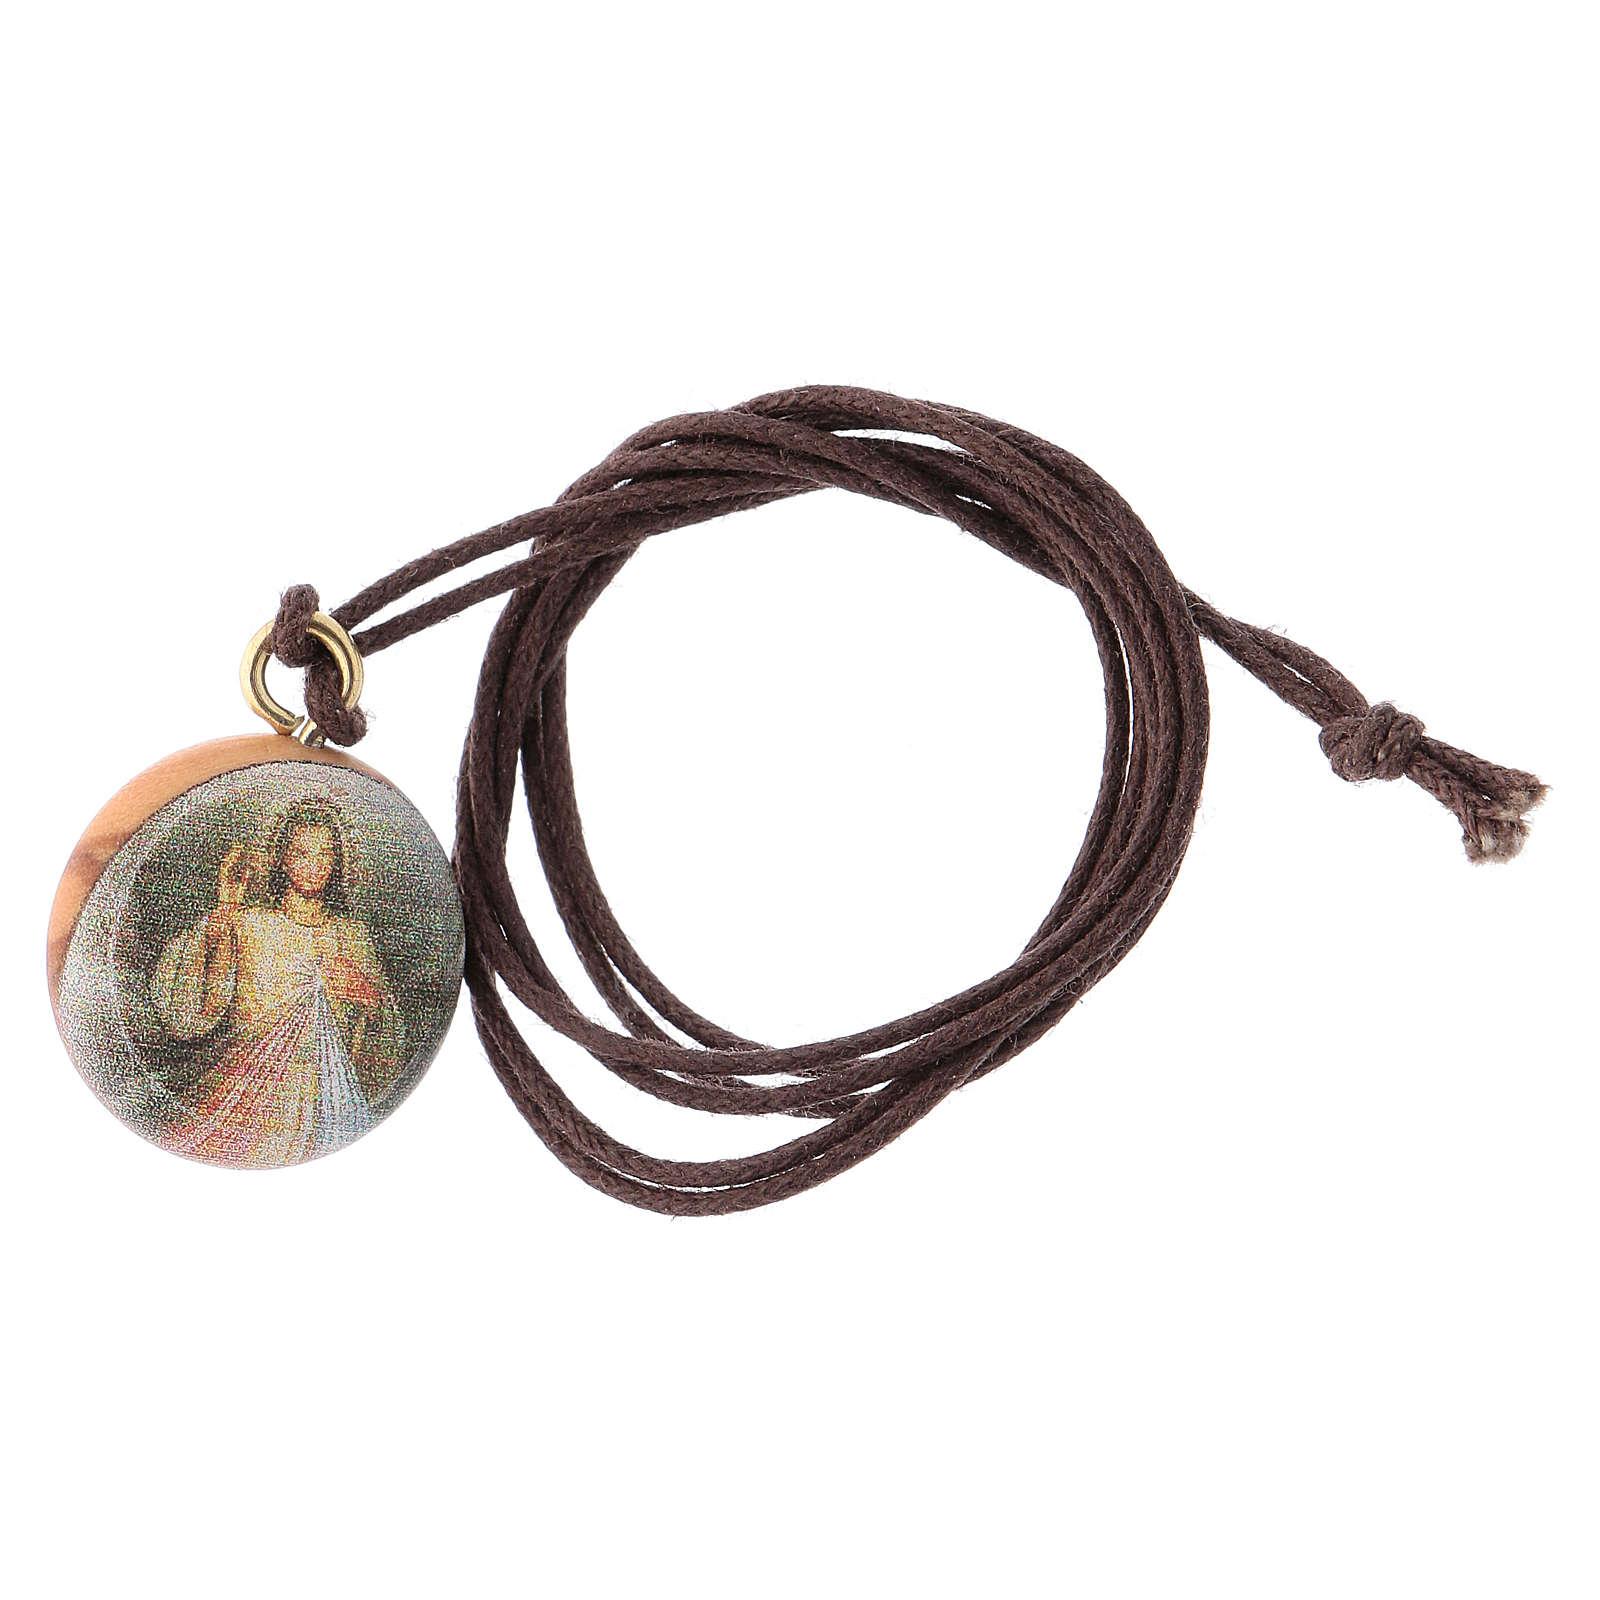 Medalla de madera de olivo Jesús Divina Misericordia 4